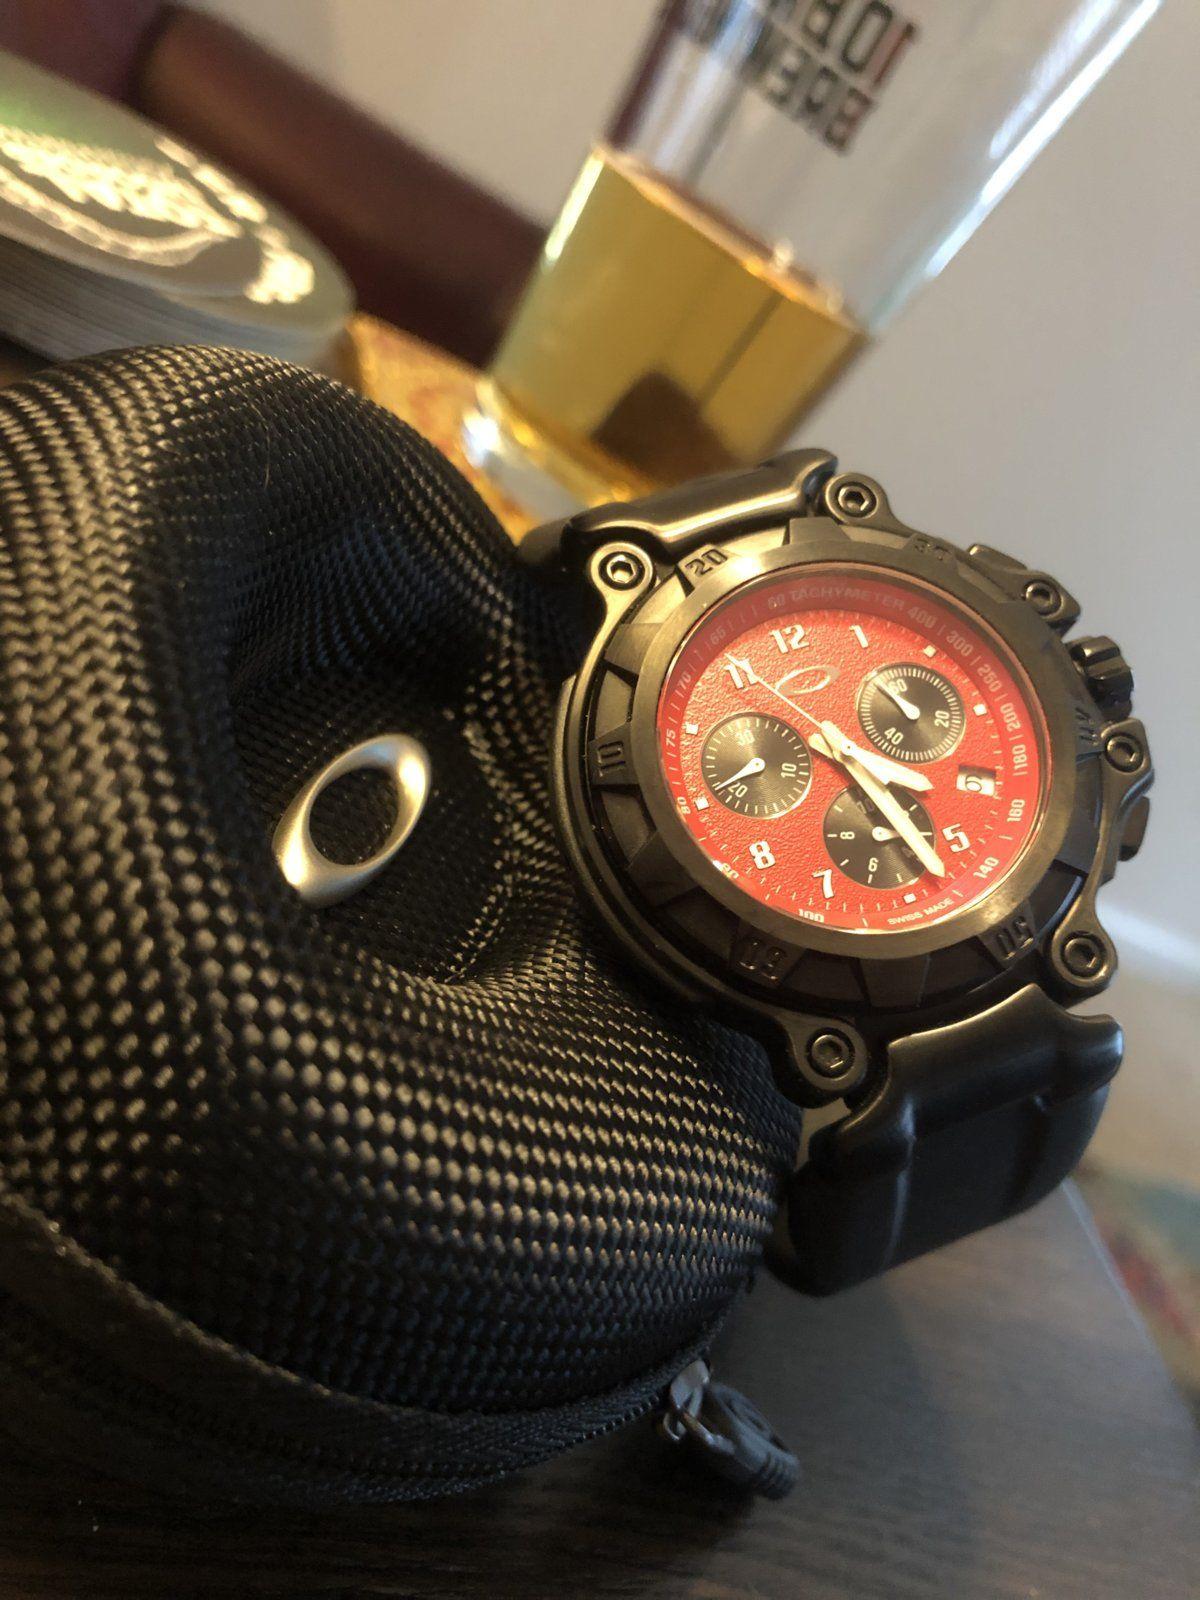 First Oakley Watch - F6D120B0-25C7-41C7-A6B3-0E567FD9F8A2.jpeg